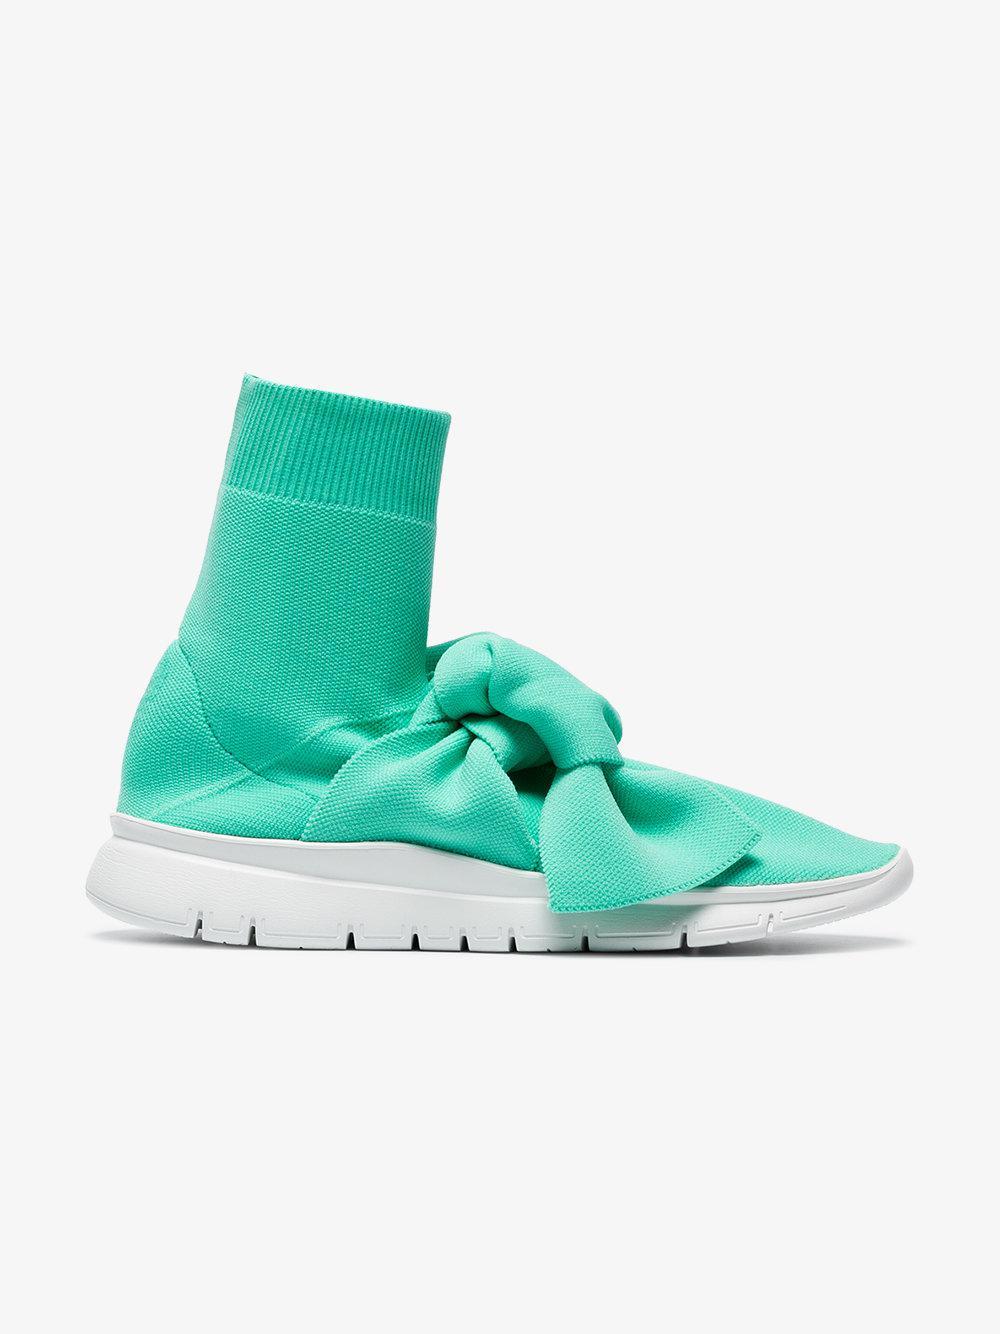 Turquoise Knot sock sneakers - Green Joshua Sanders 2p5XH5CD0